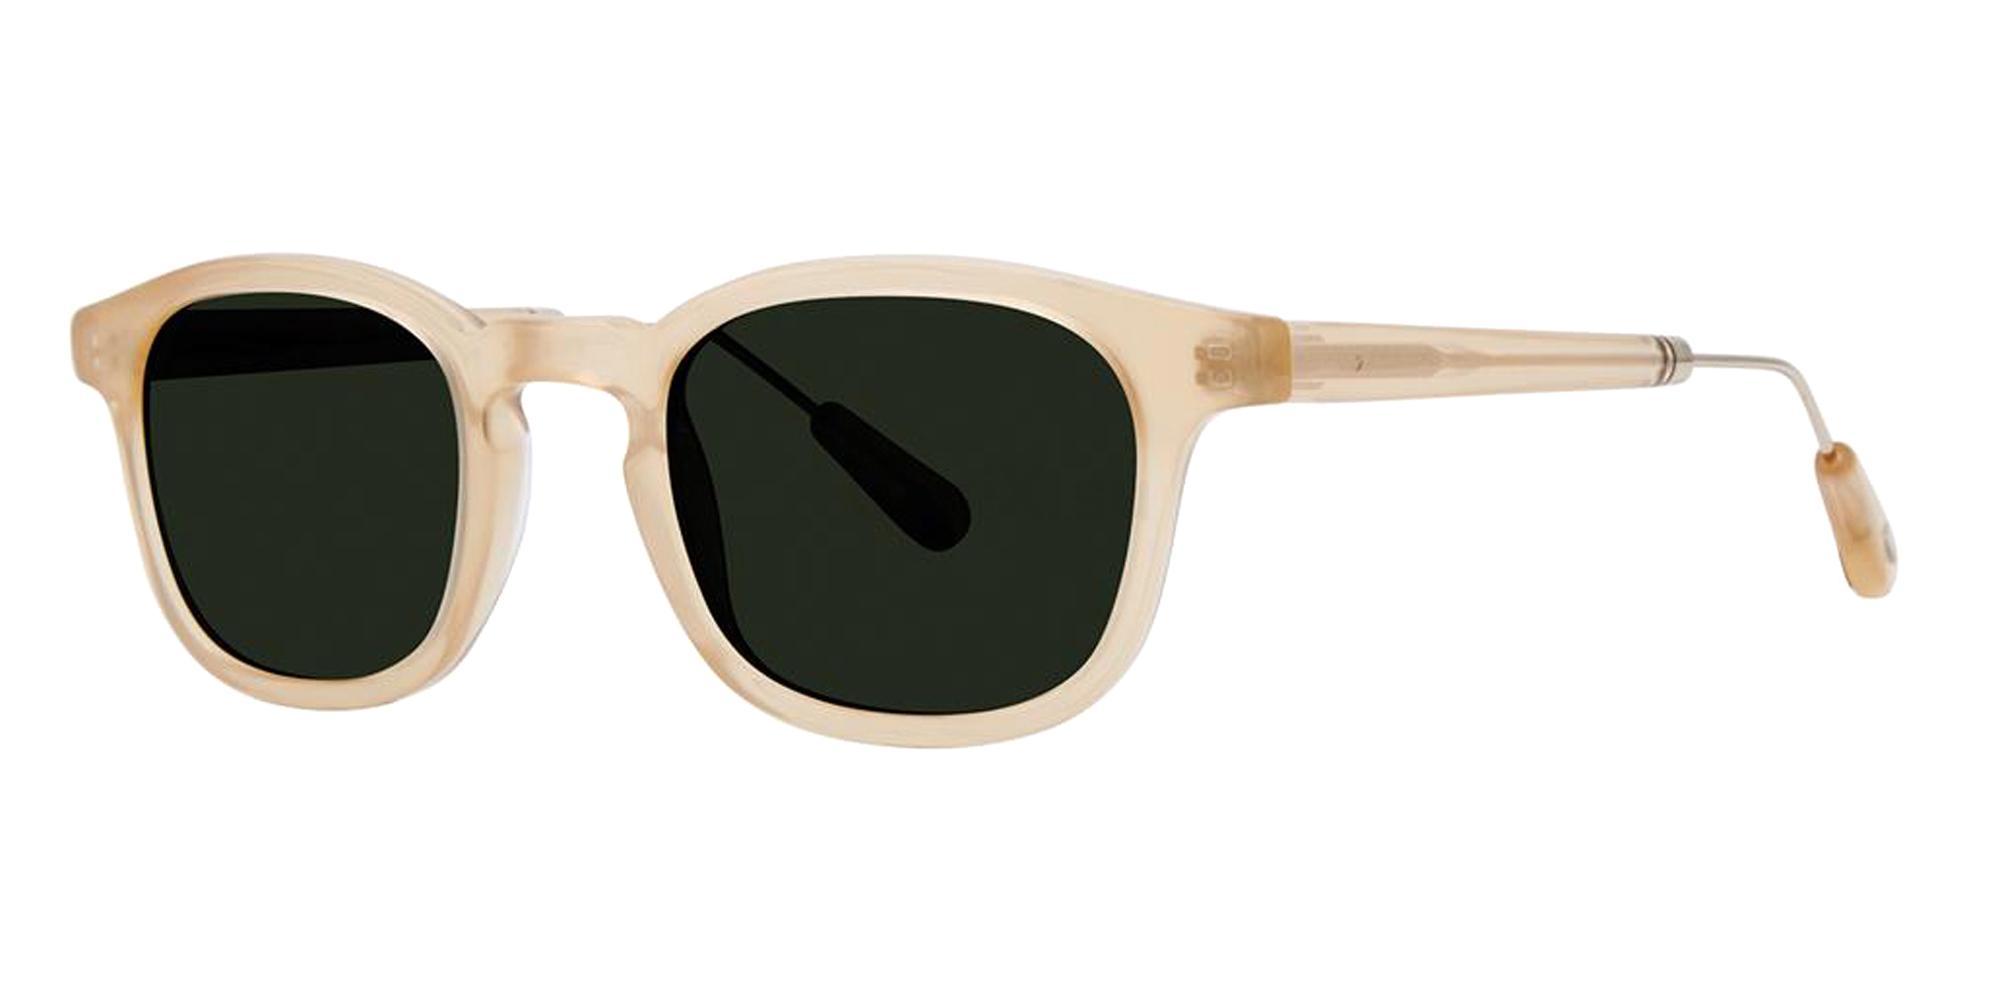 Crystal Sand DESMOND Sunglasses, Zac Posen